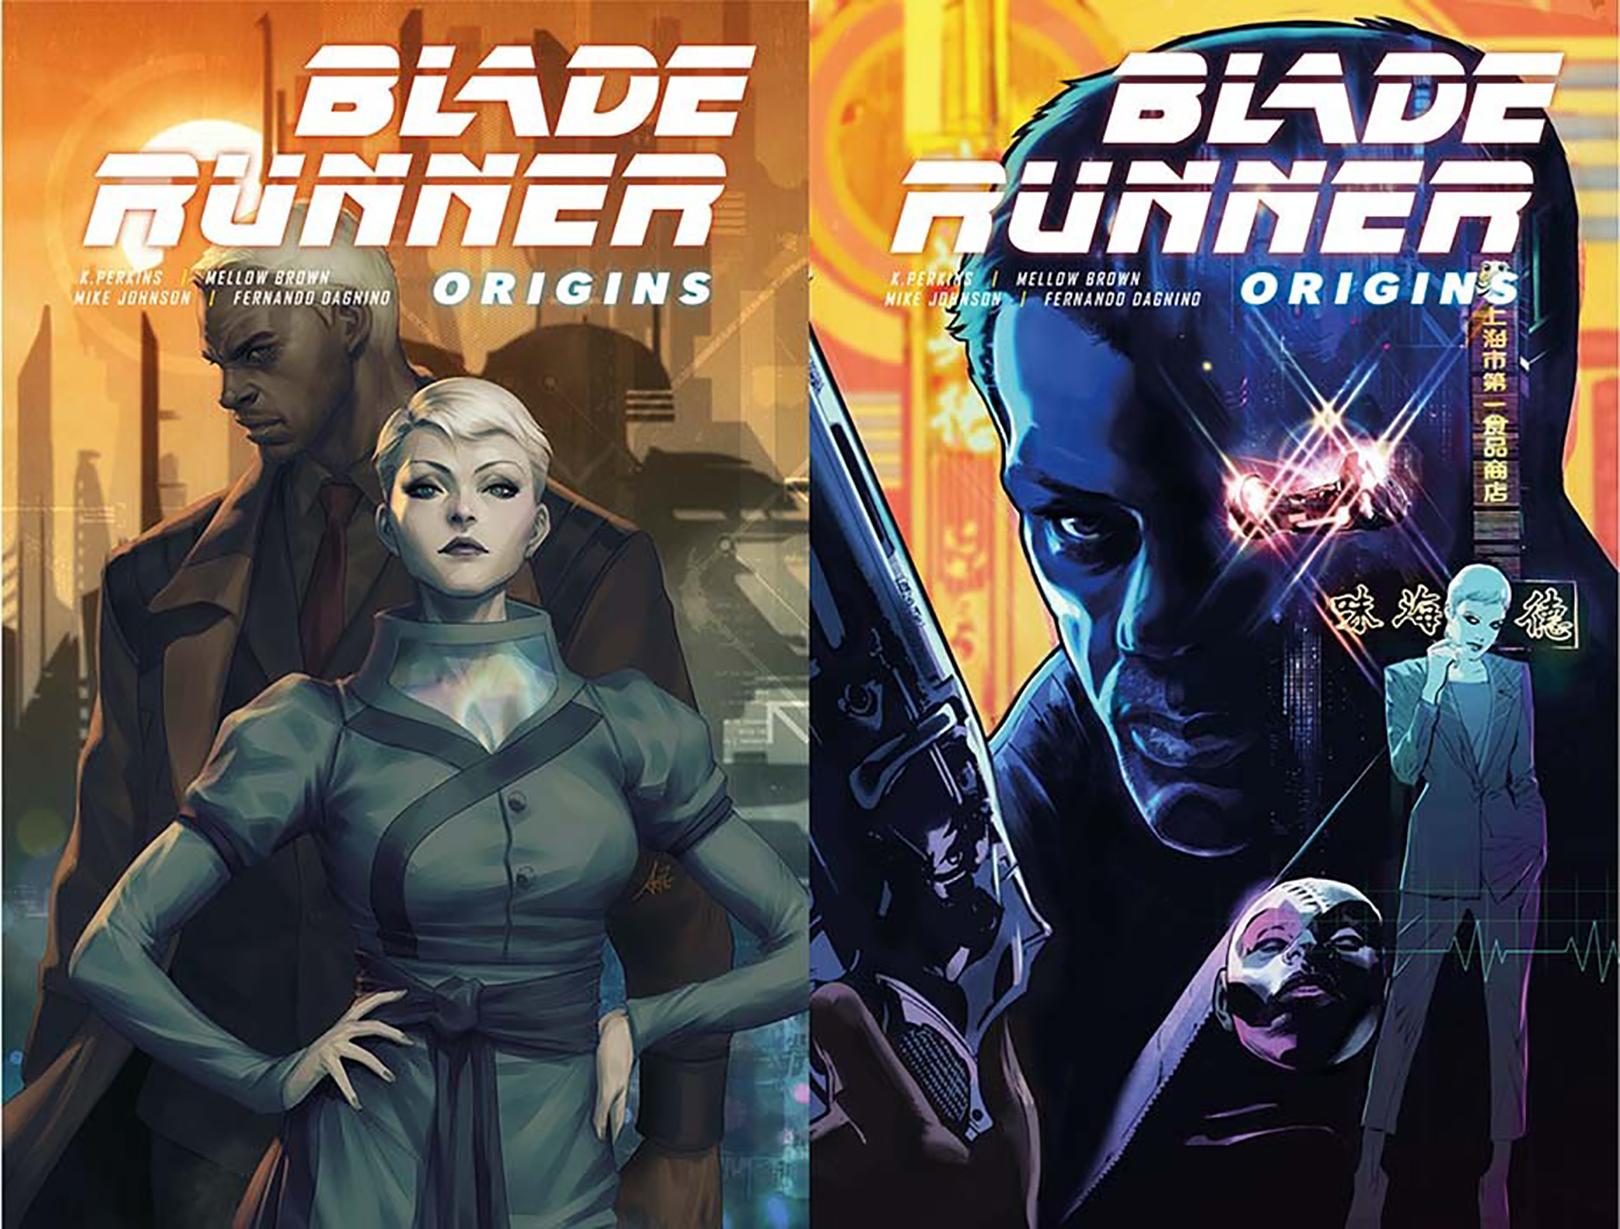 Blade Runner Origins - naslovnice